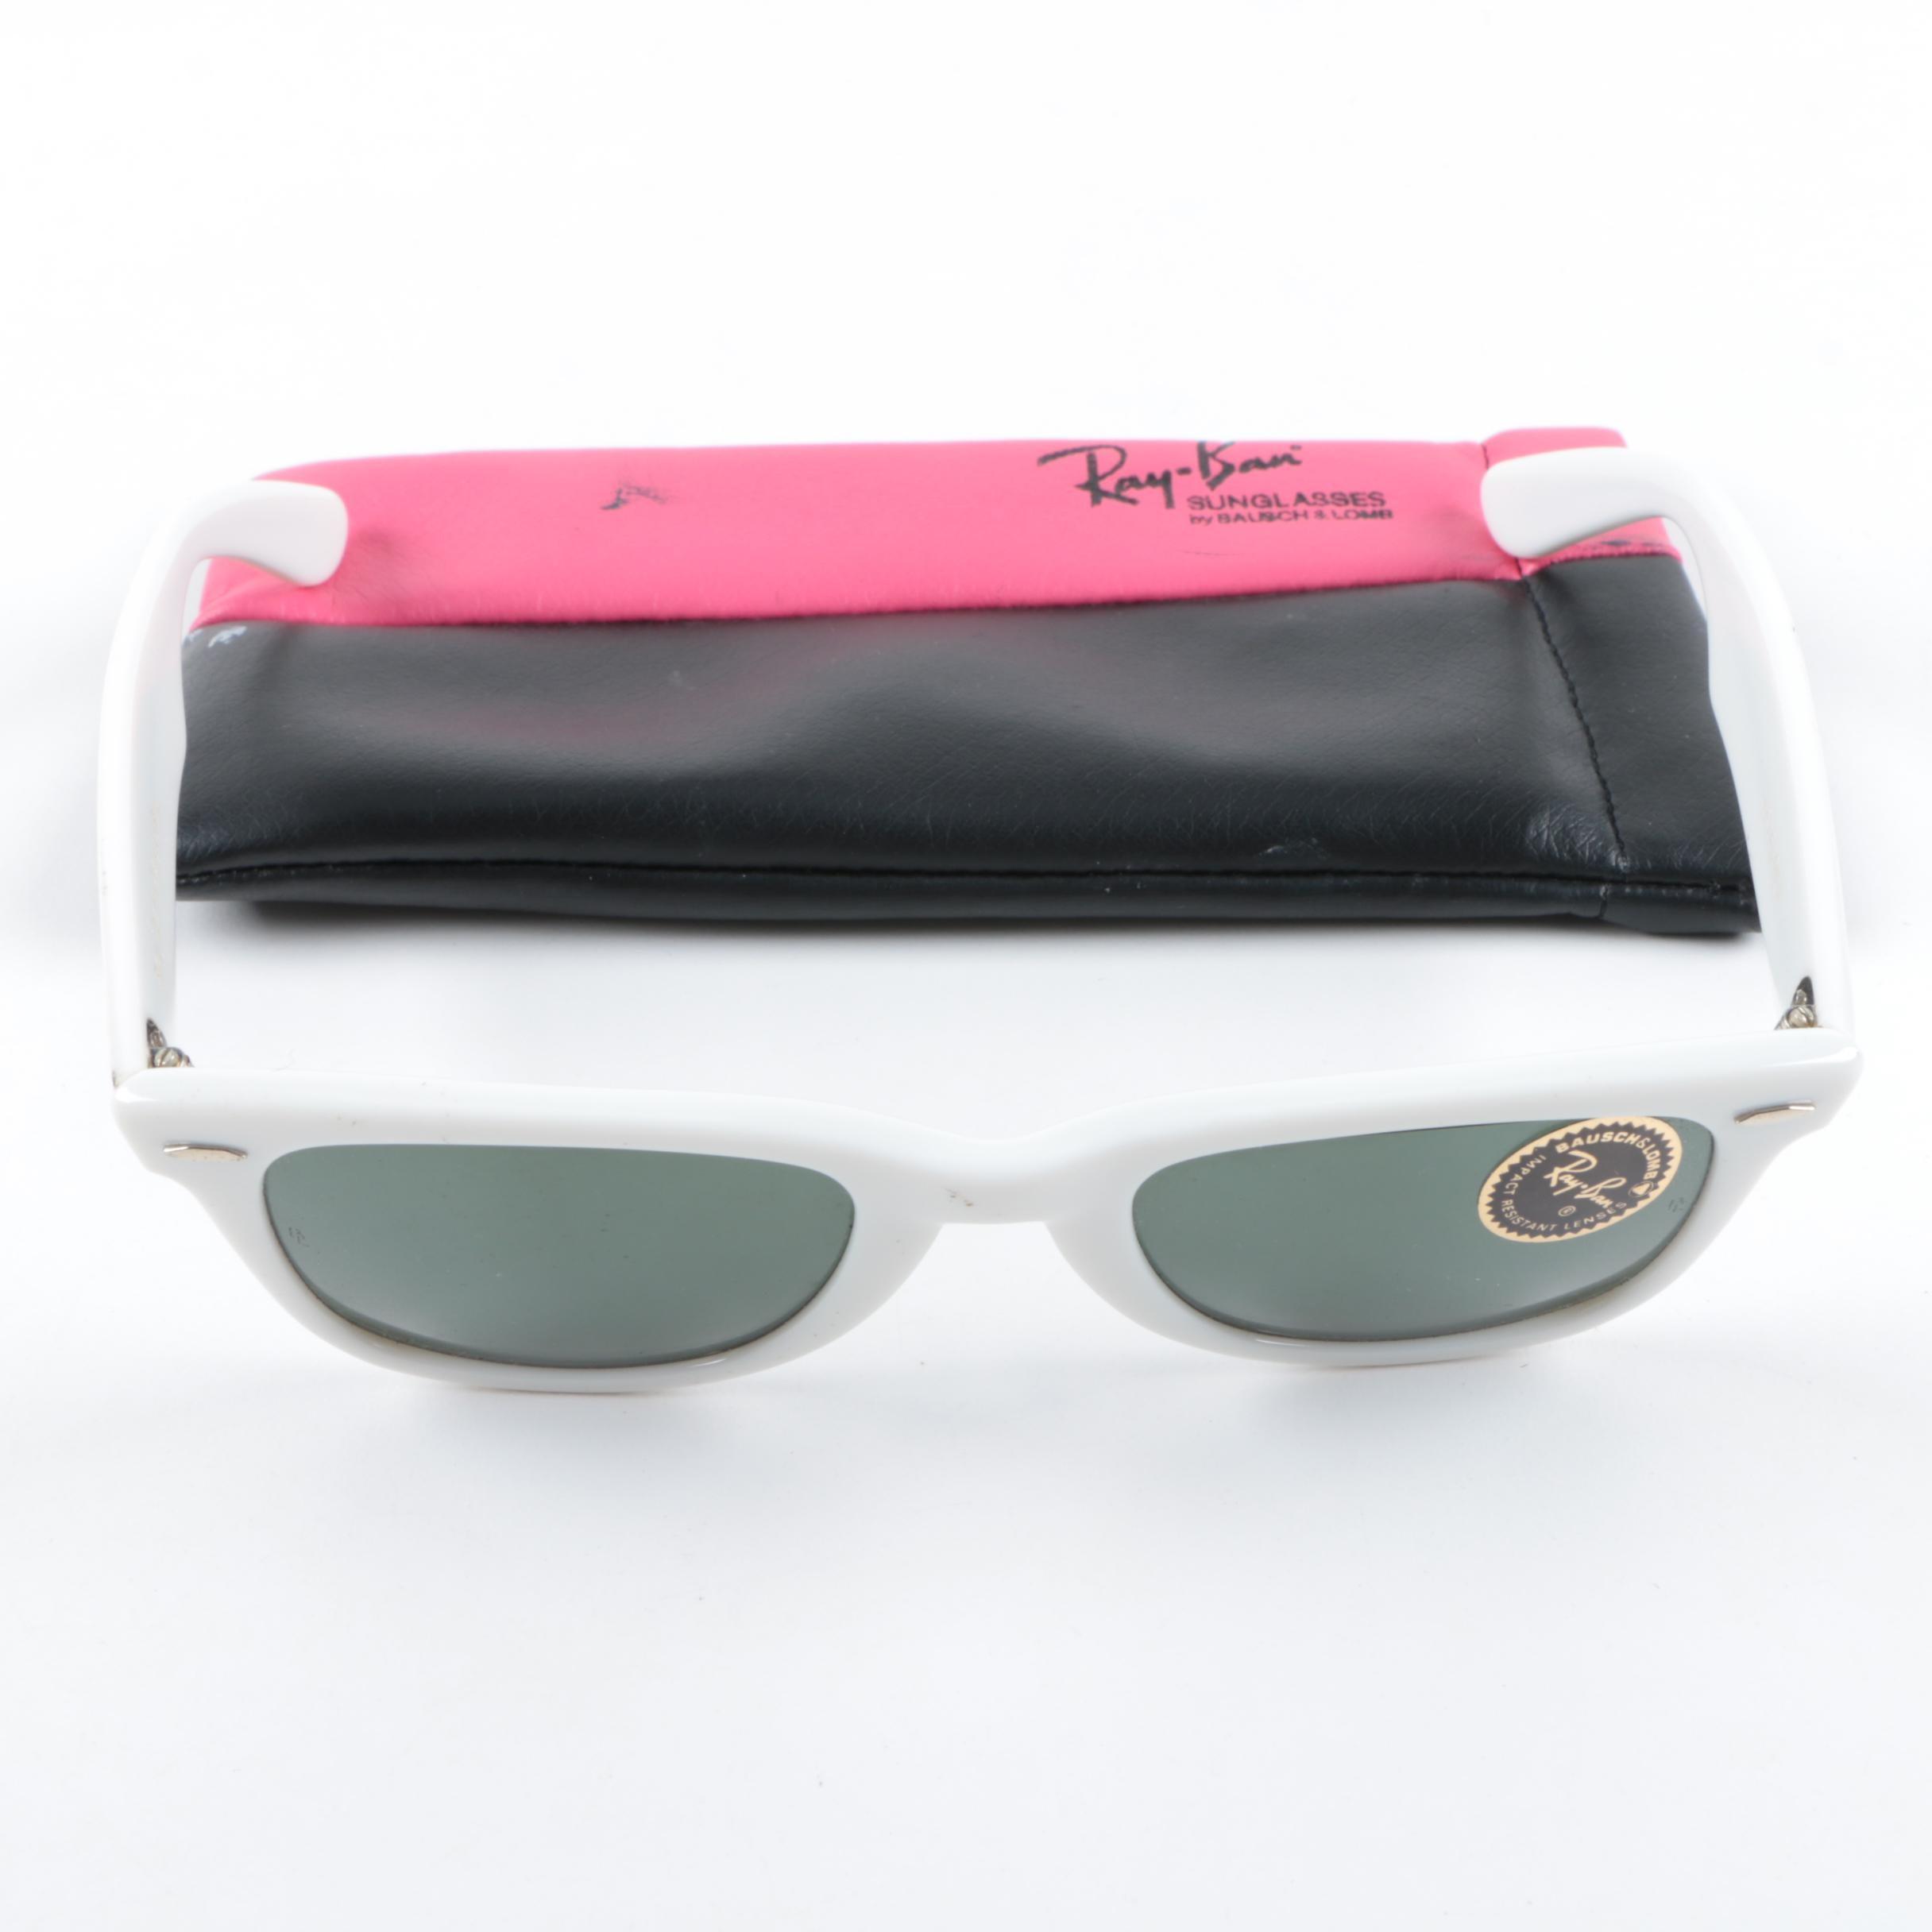 1980s Vintage Ray-Ban Bausch & Lomb White Wayfarer Sunglasses